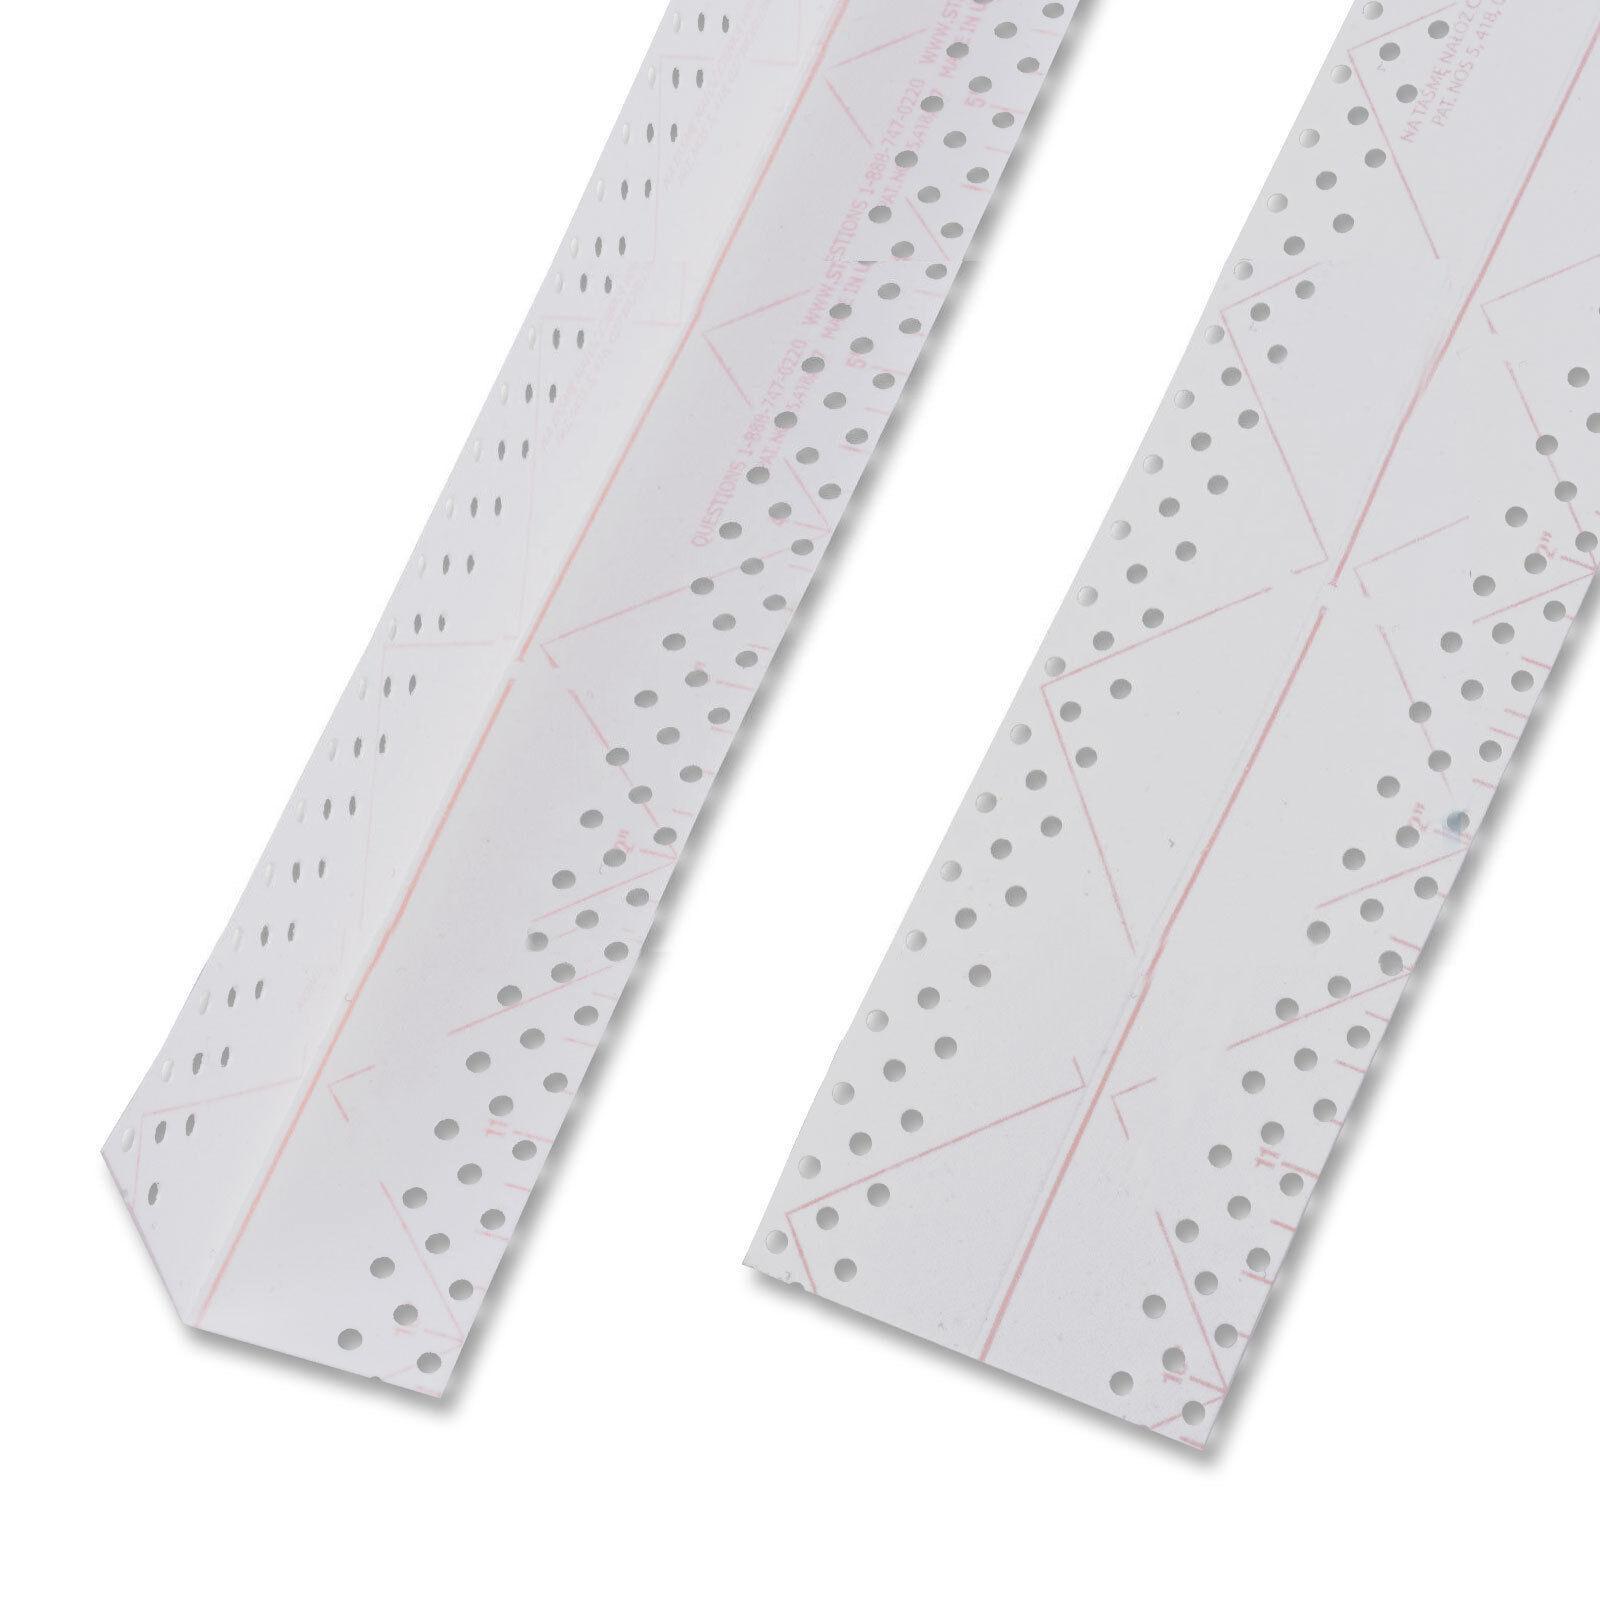 strait-flex tuff-tape eckschiene trockenbau gipskarton